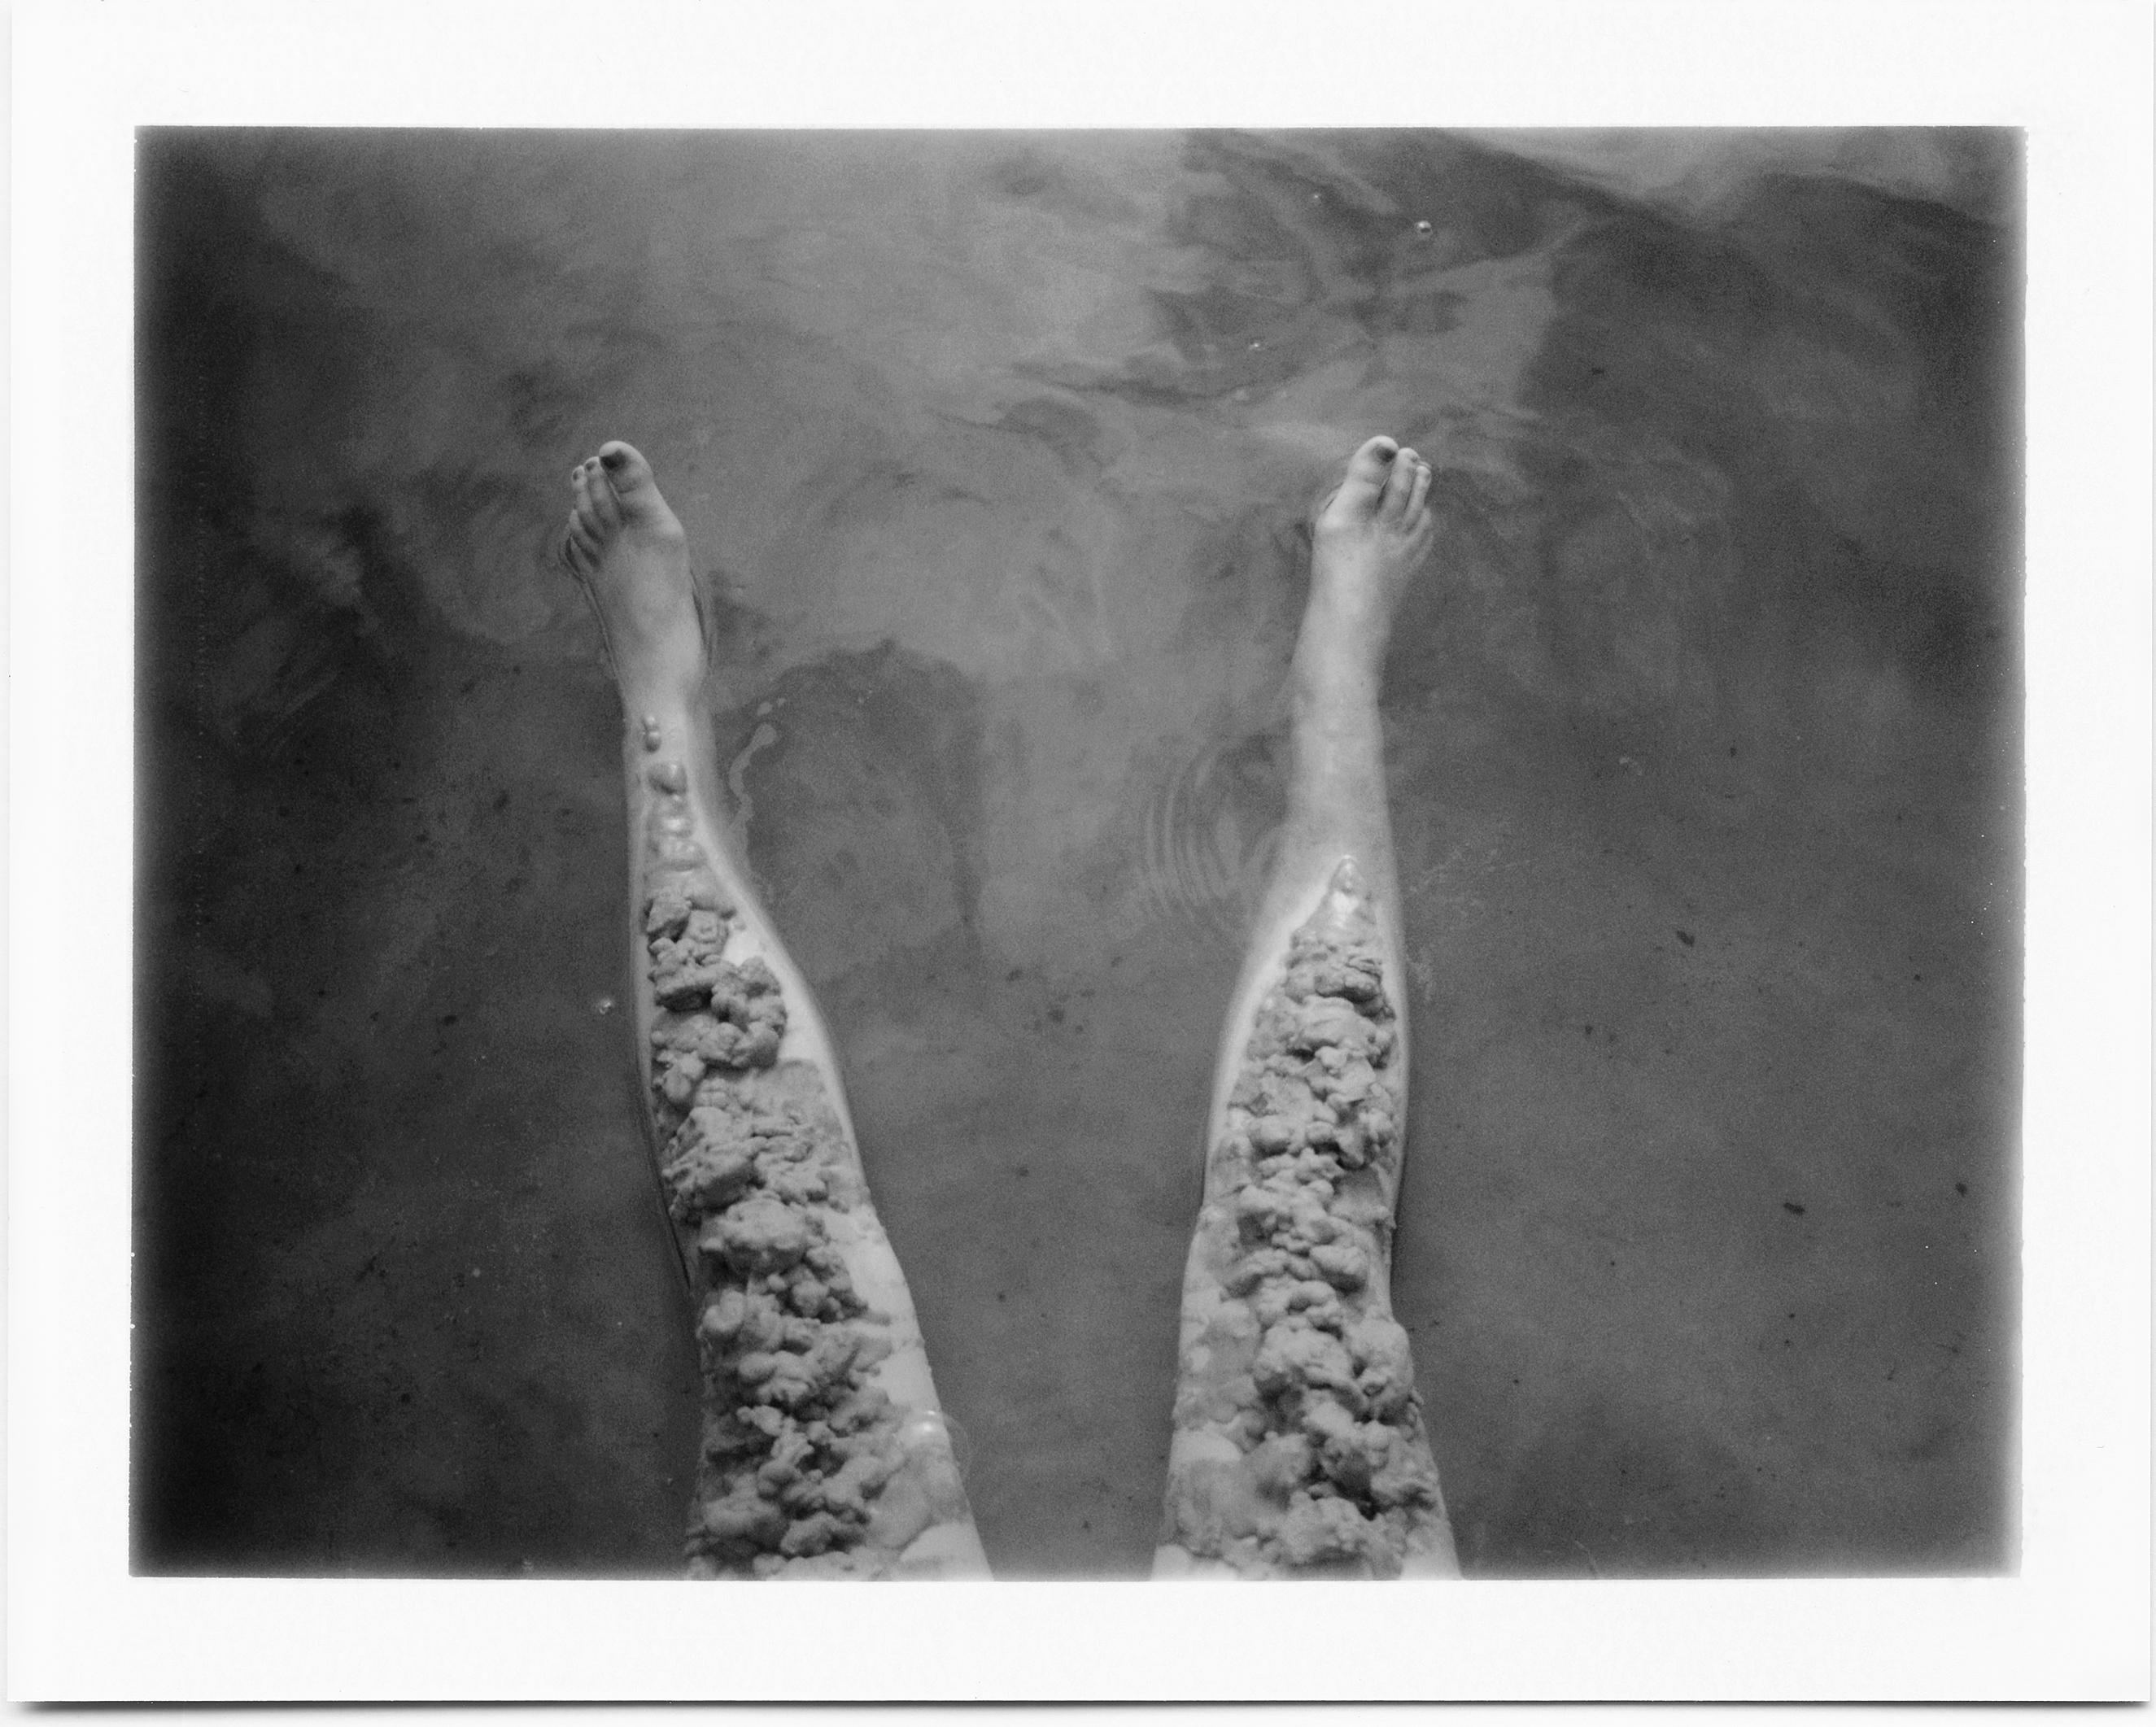 Ritual (Mud Bath), The Little Pee Dee River, SC, Summer 2016